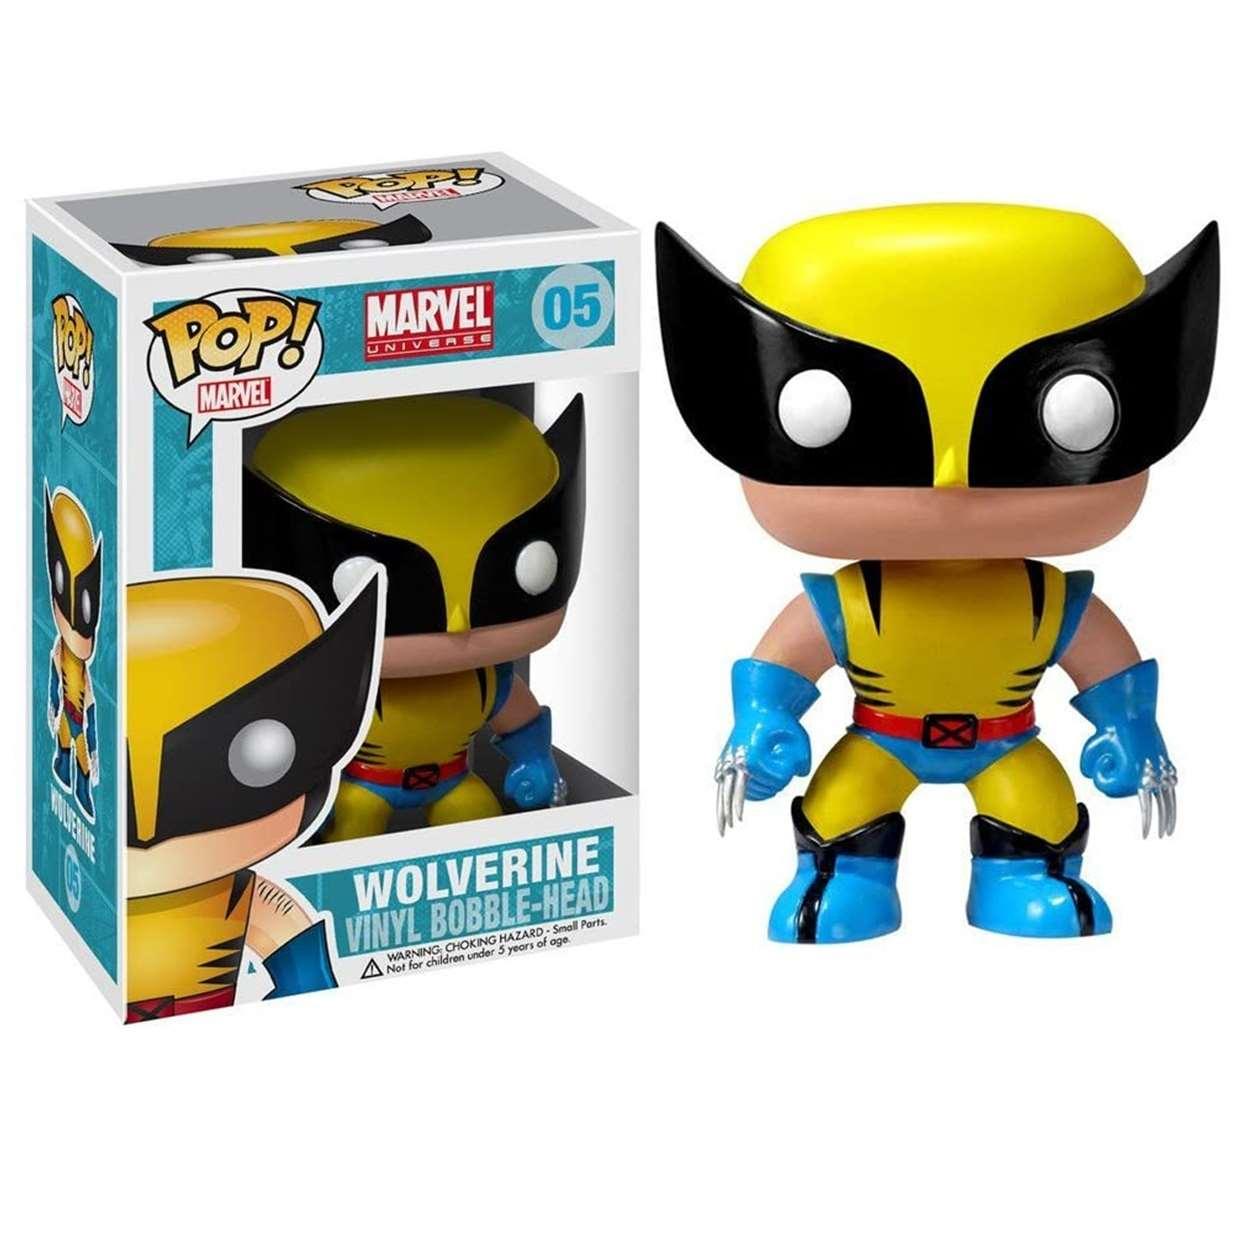 Wolverine #05 Figura X Men Funko Pop! Marvel Universe